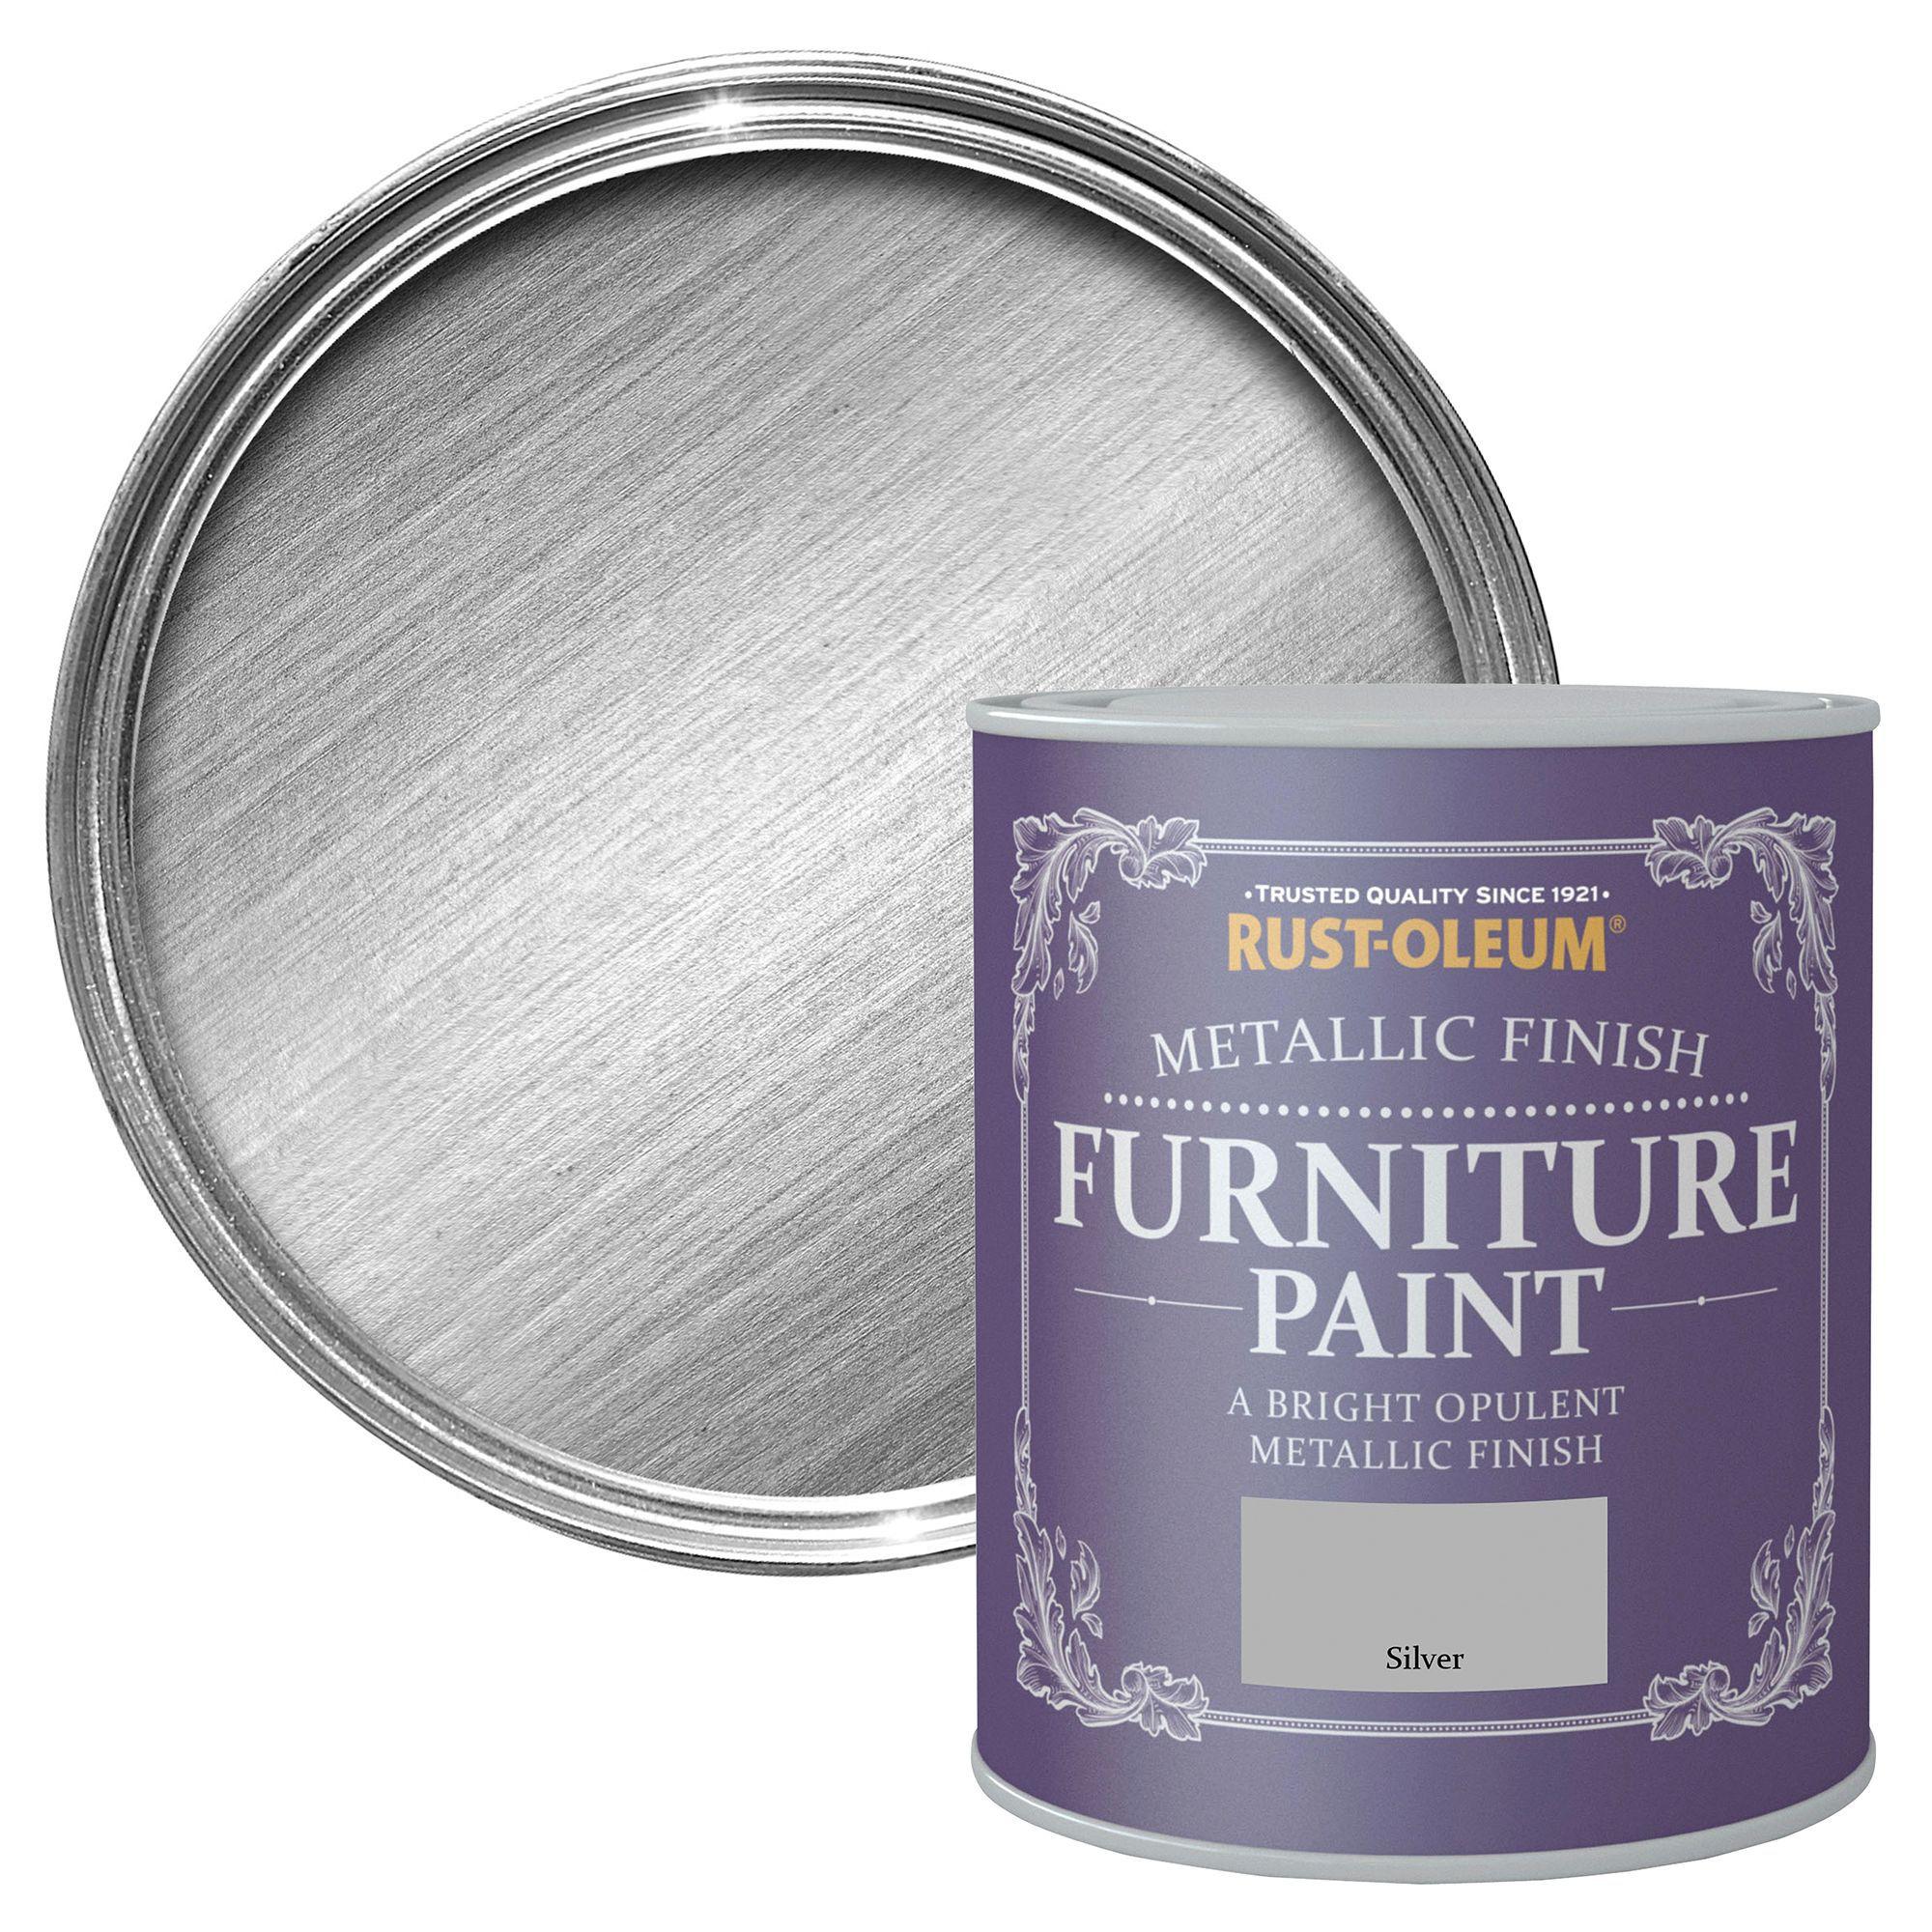 Rust-oleum Rust-oleum Silver Metallic Metallic Furniture Paint 750 Ml